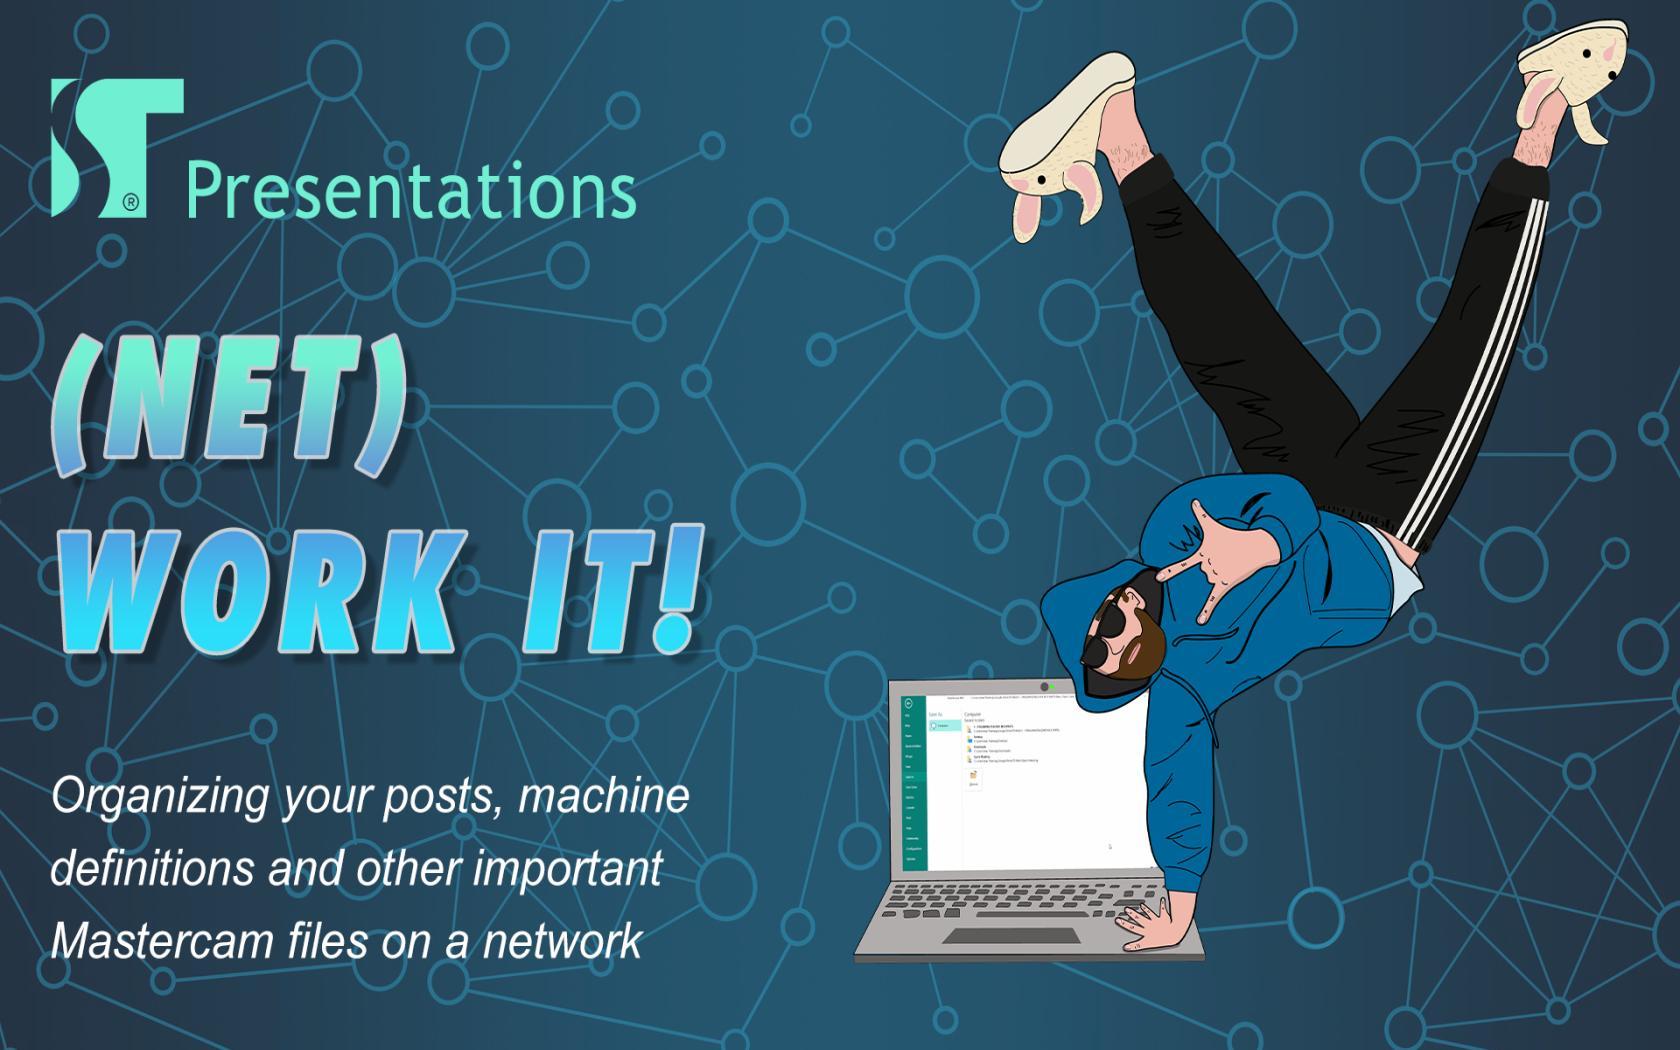 (Net)Work it! (Running Mastercam on a network)